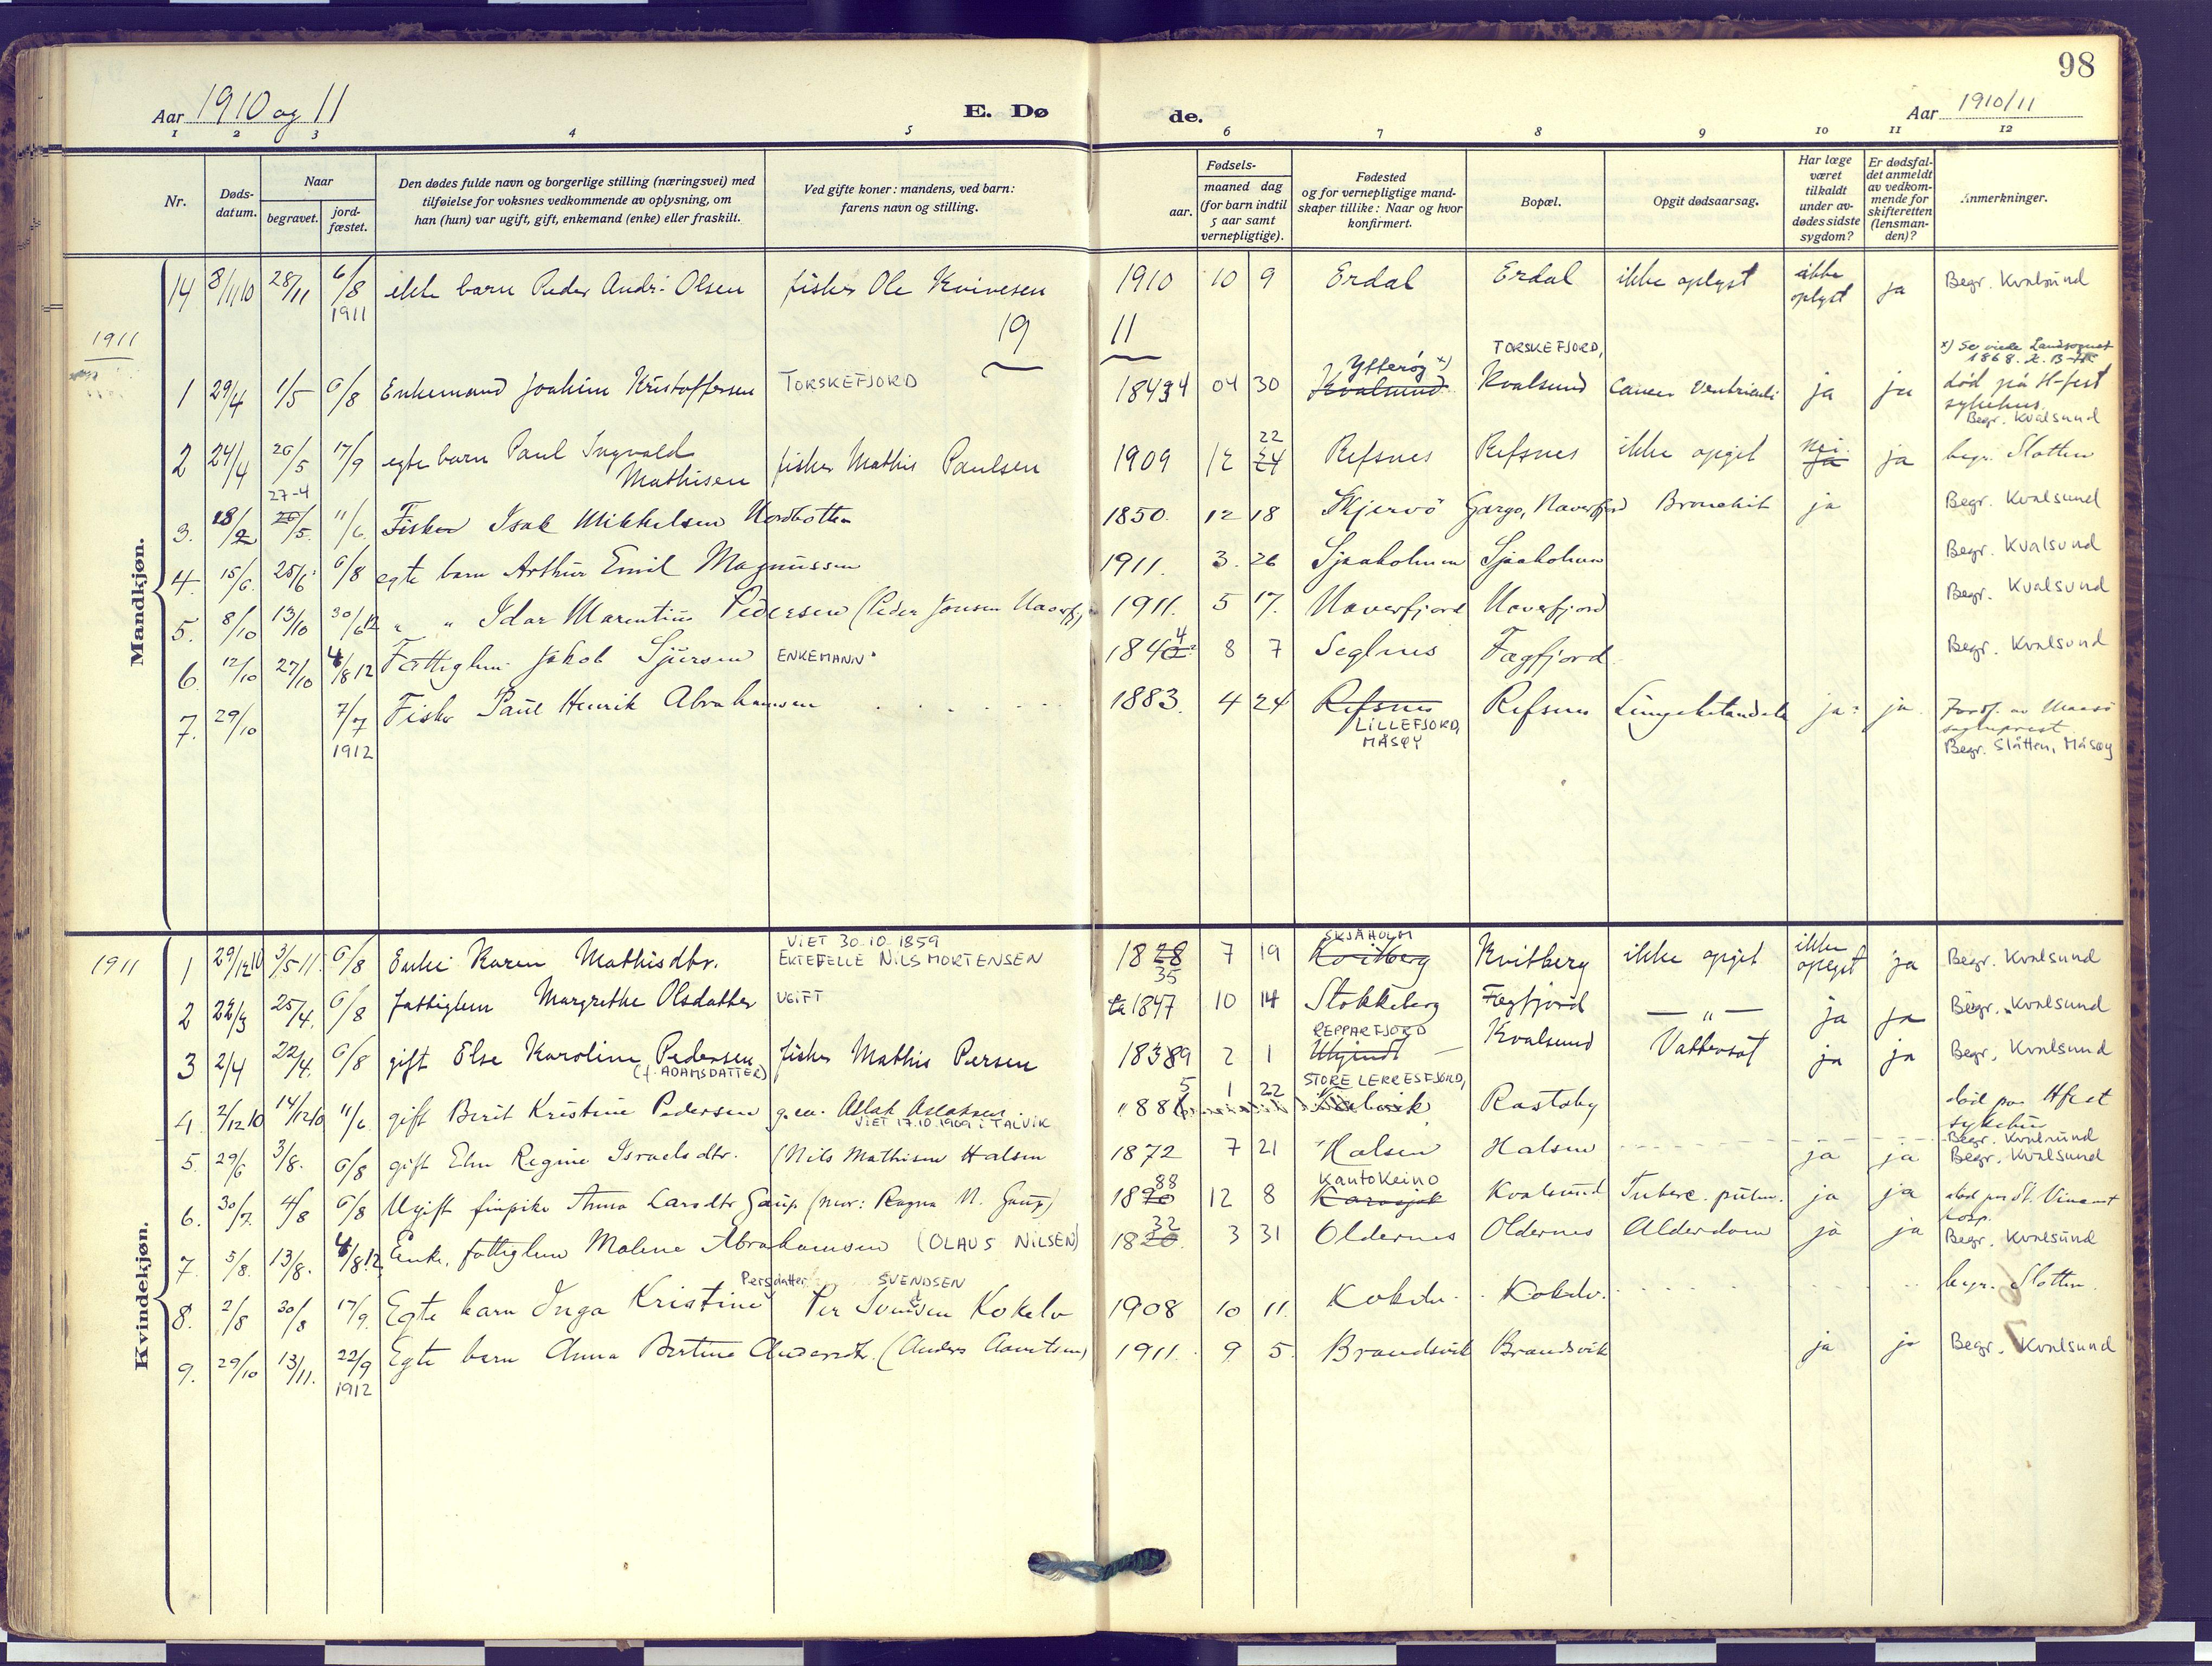 SATØ, Hammerfest sokneprestembete, Ministerialbok nr. 16, 1908-1923, s. 98